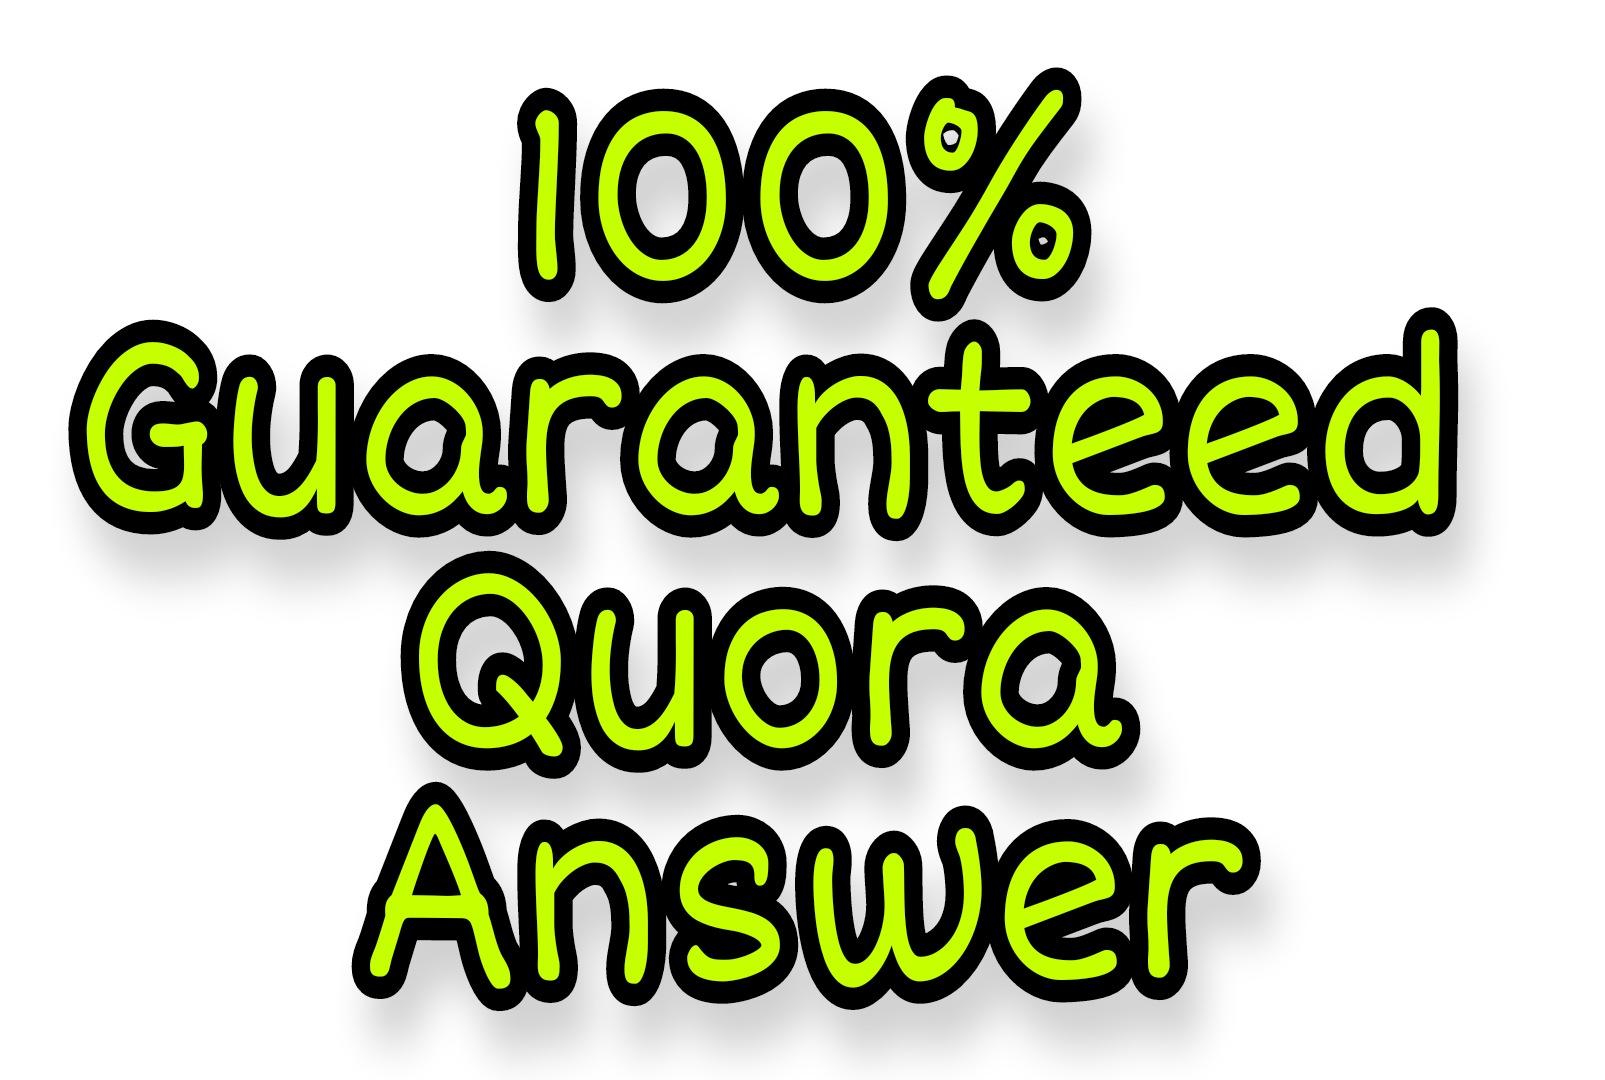 100 Guaranteed 5 Quora Answer